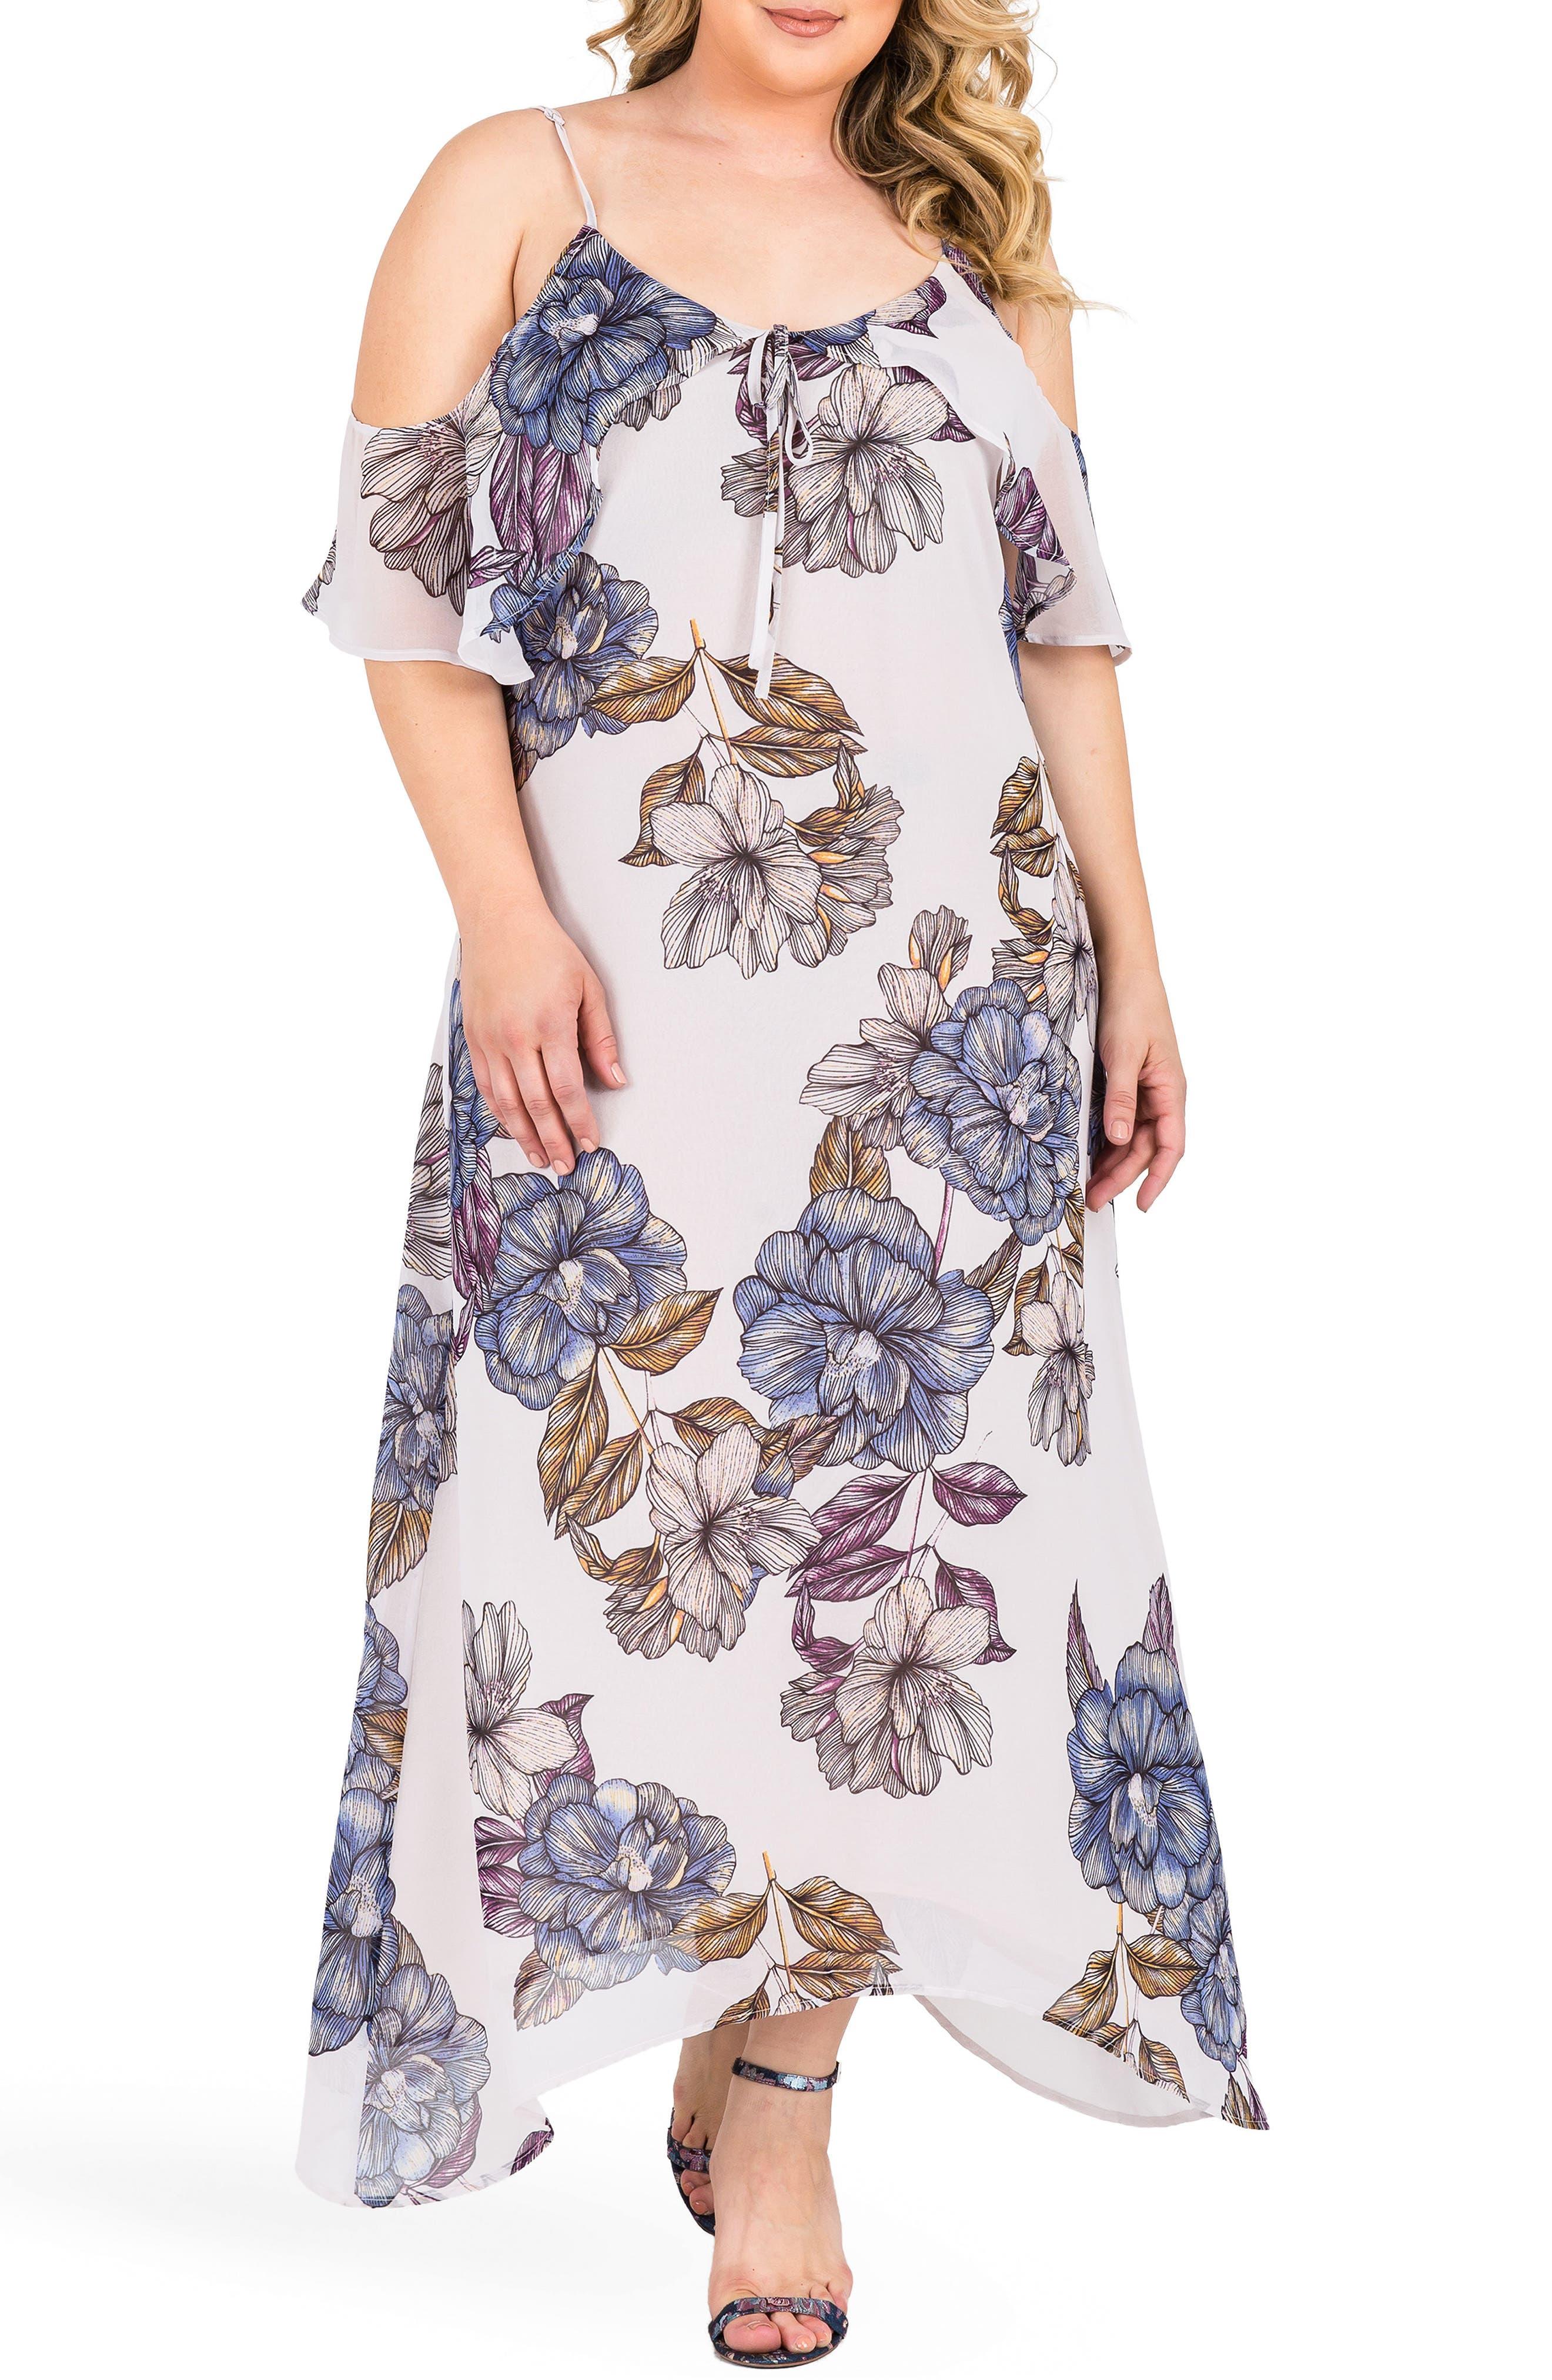 Matilda Floral Cold Shoulder Maxi Dress,                         Main,                         color, Light Gray Floral Print